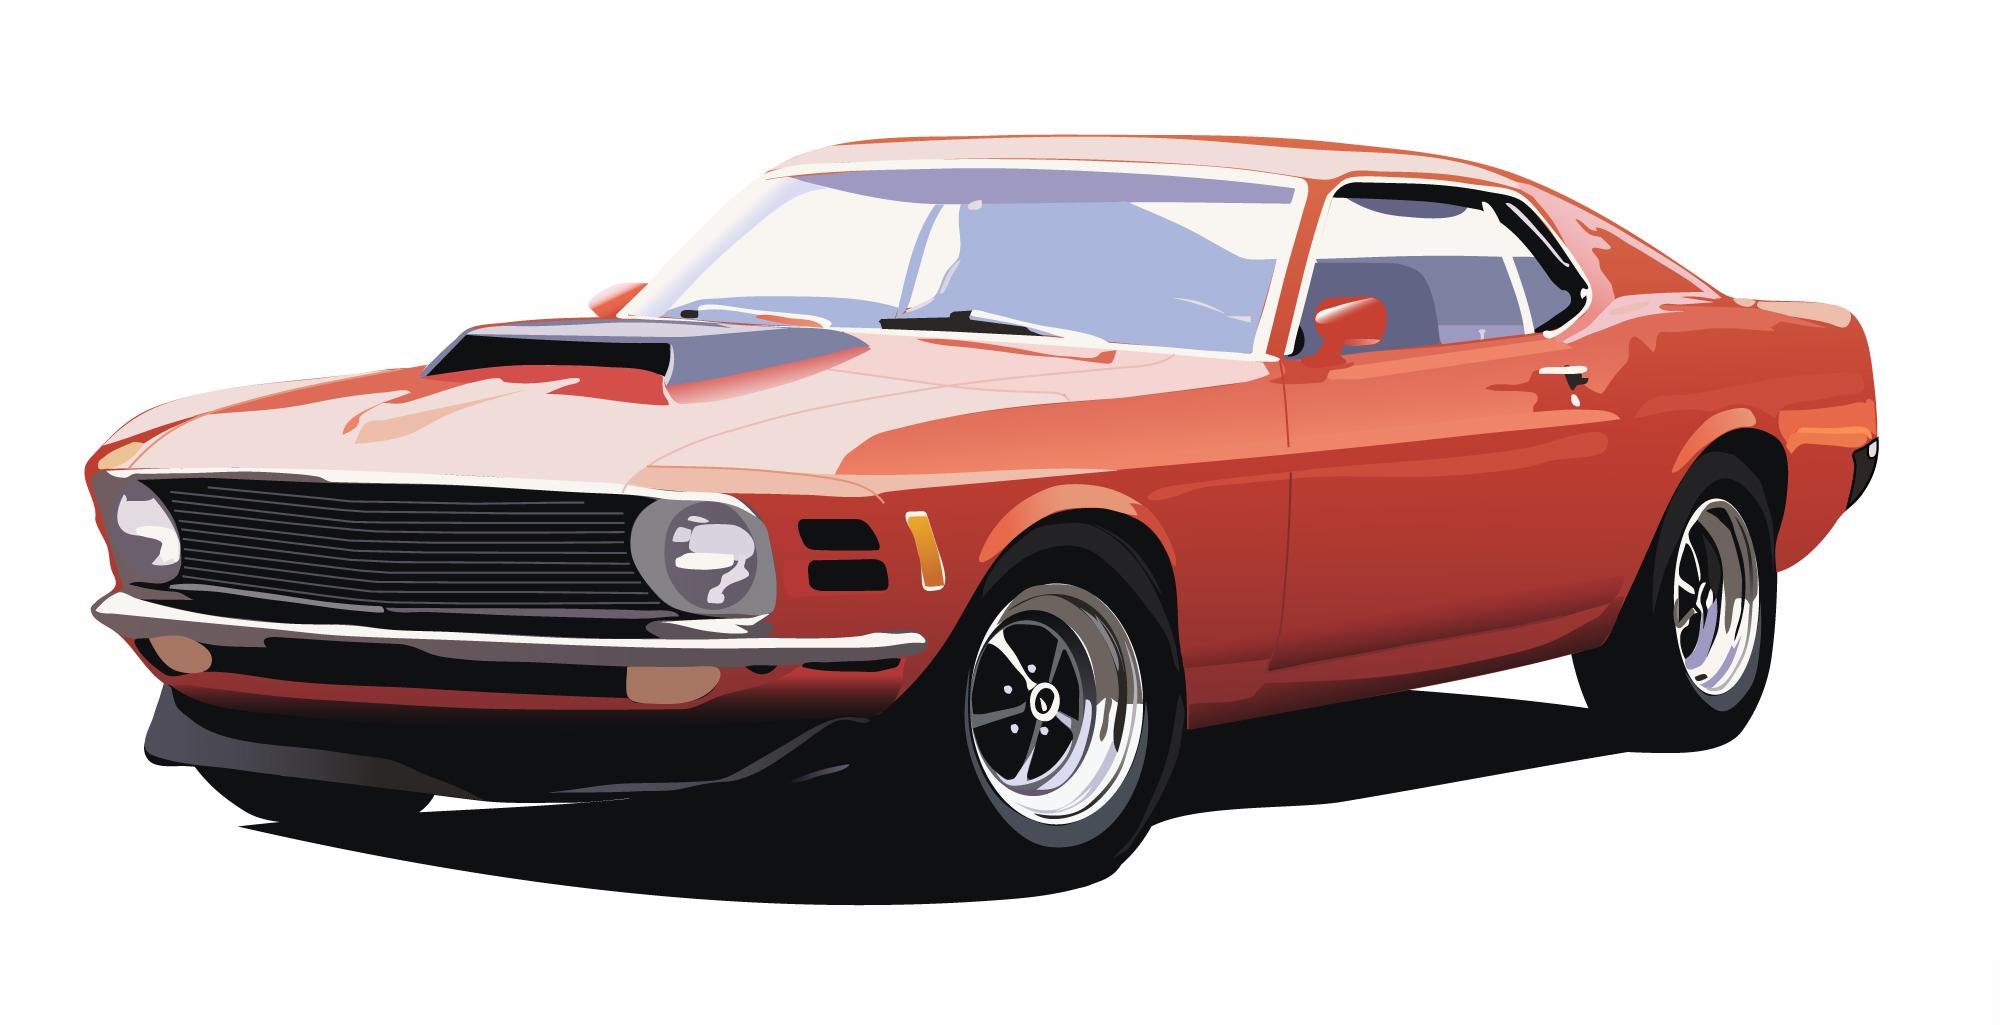 An illustration of a vintage red car